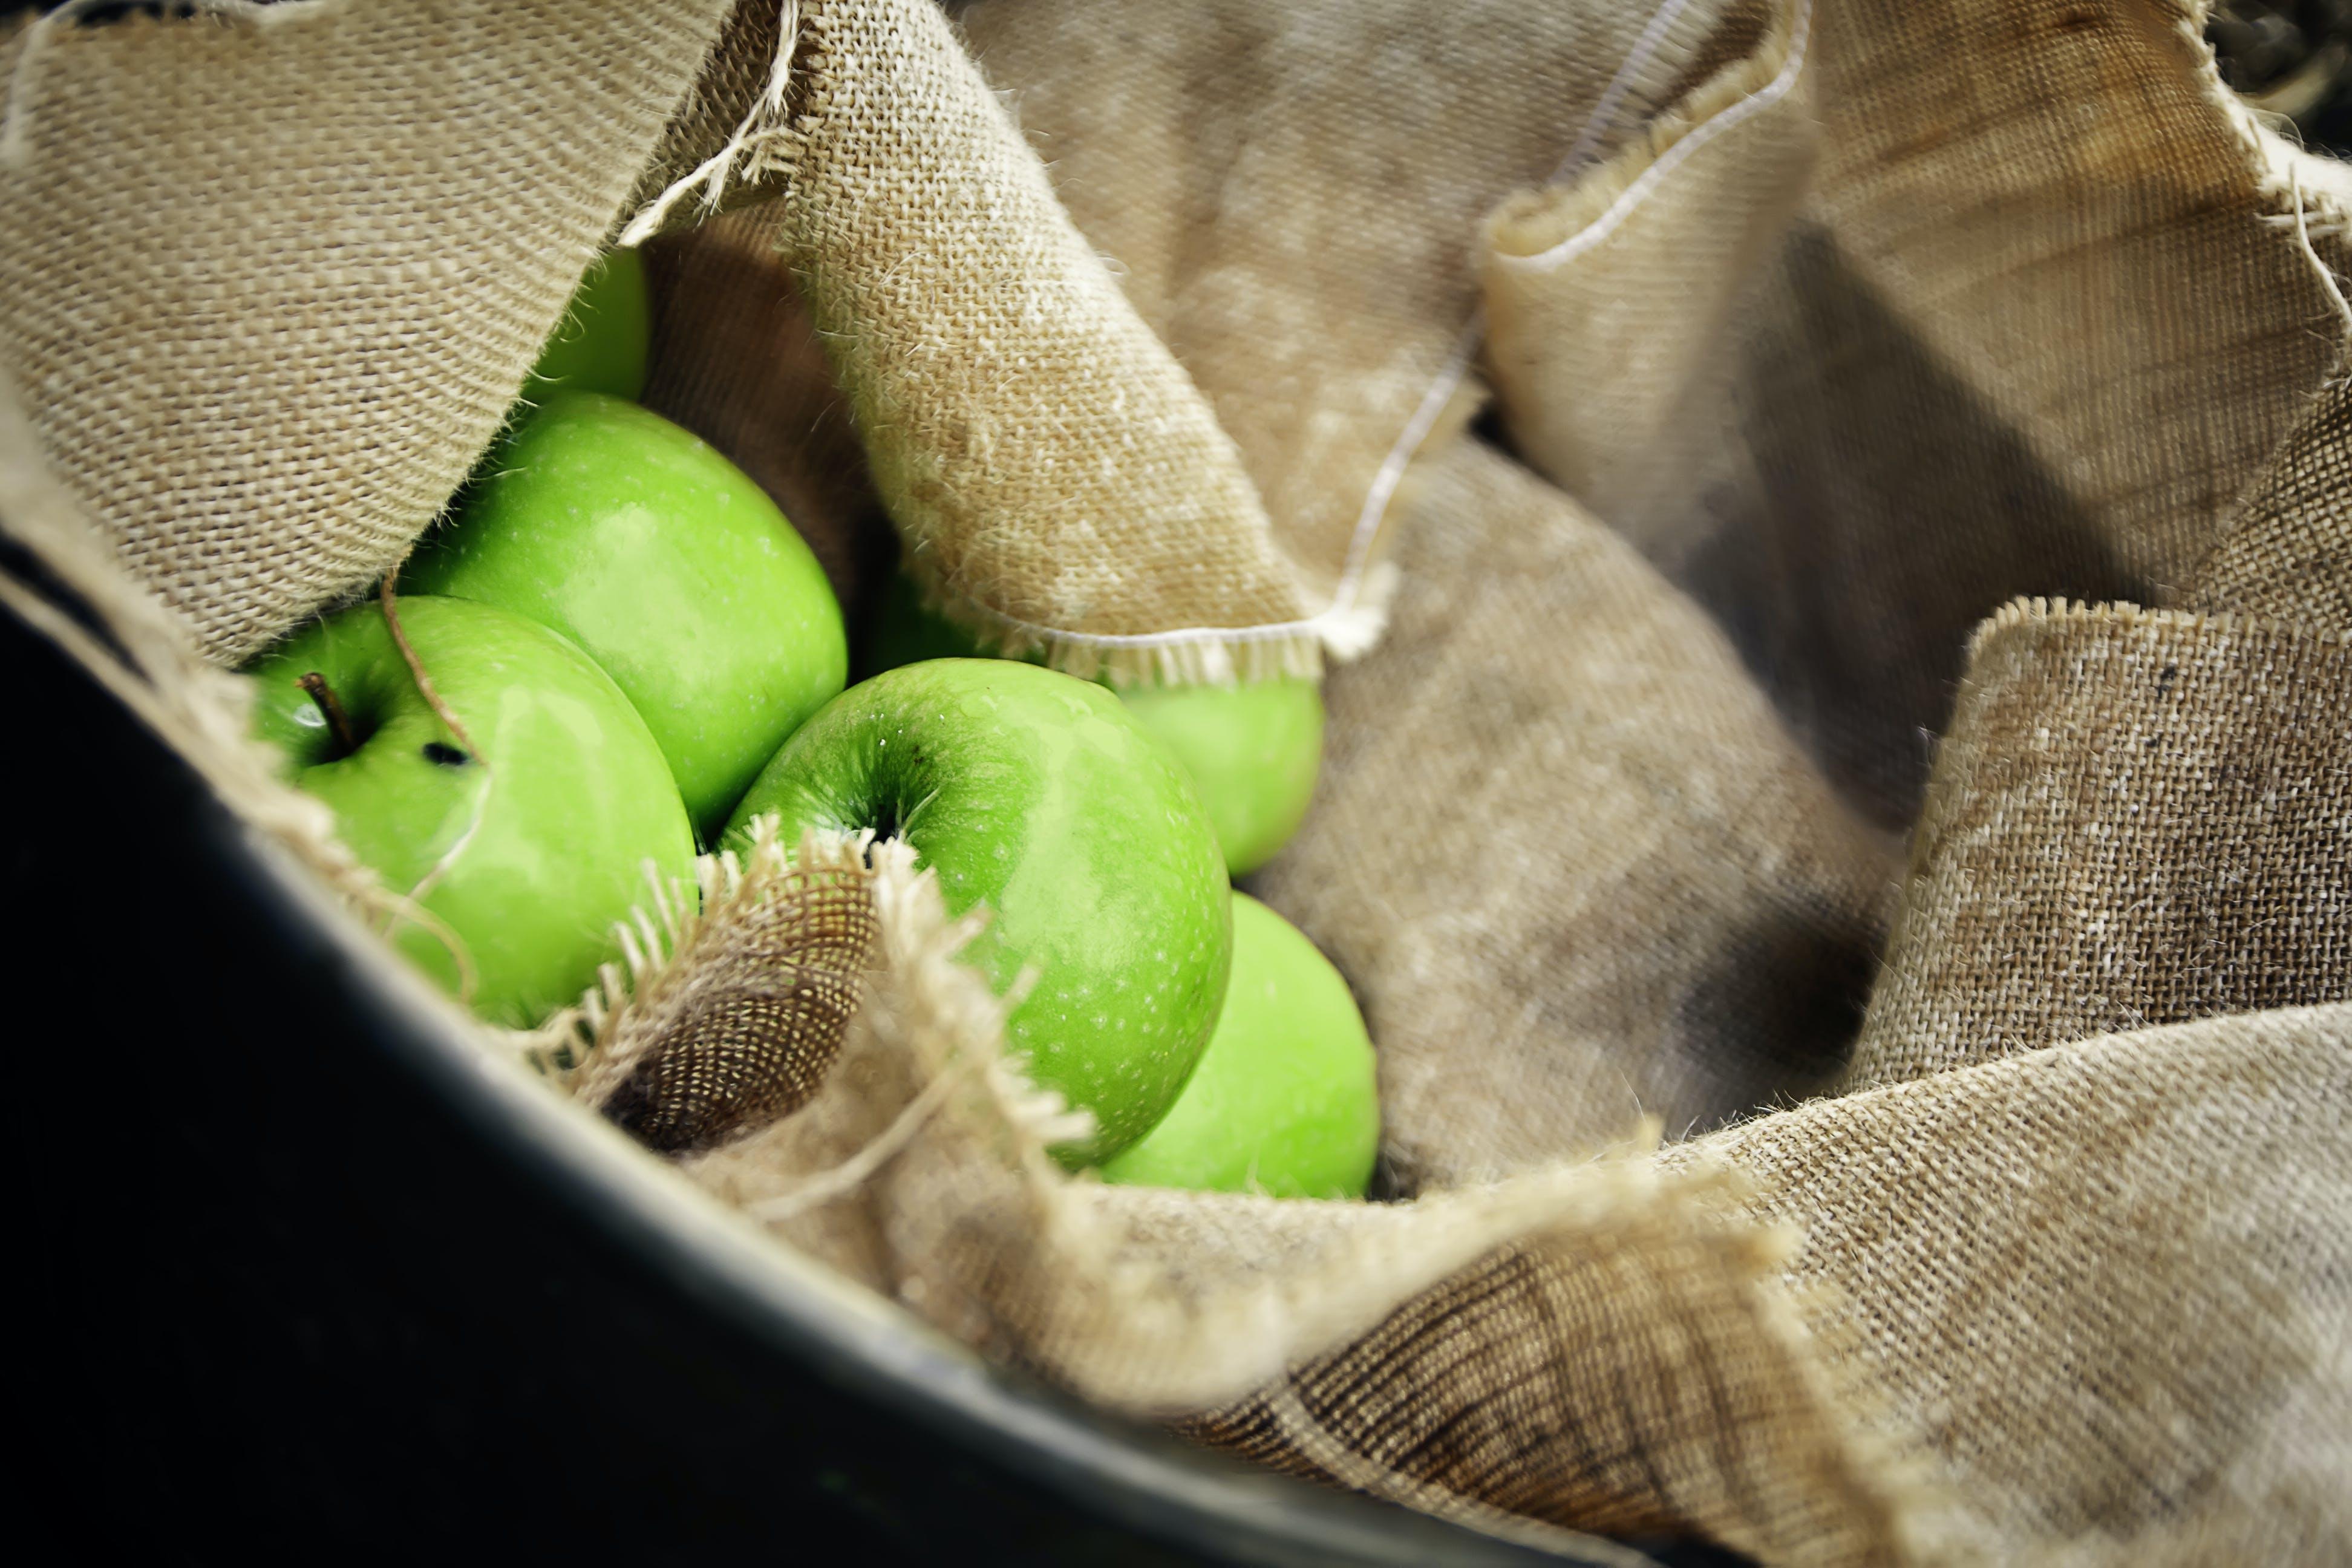 Macro Shot Photo of Green Apples